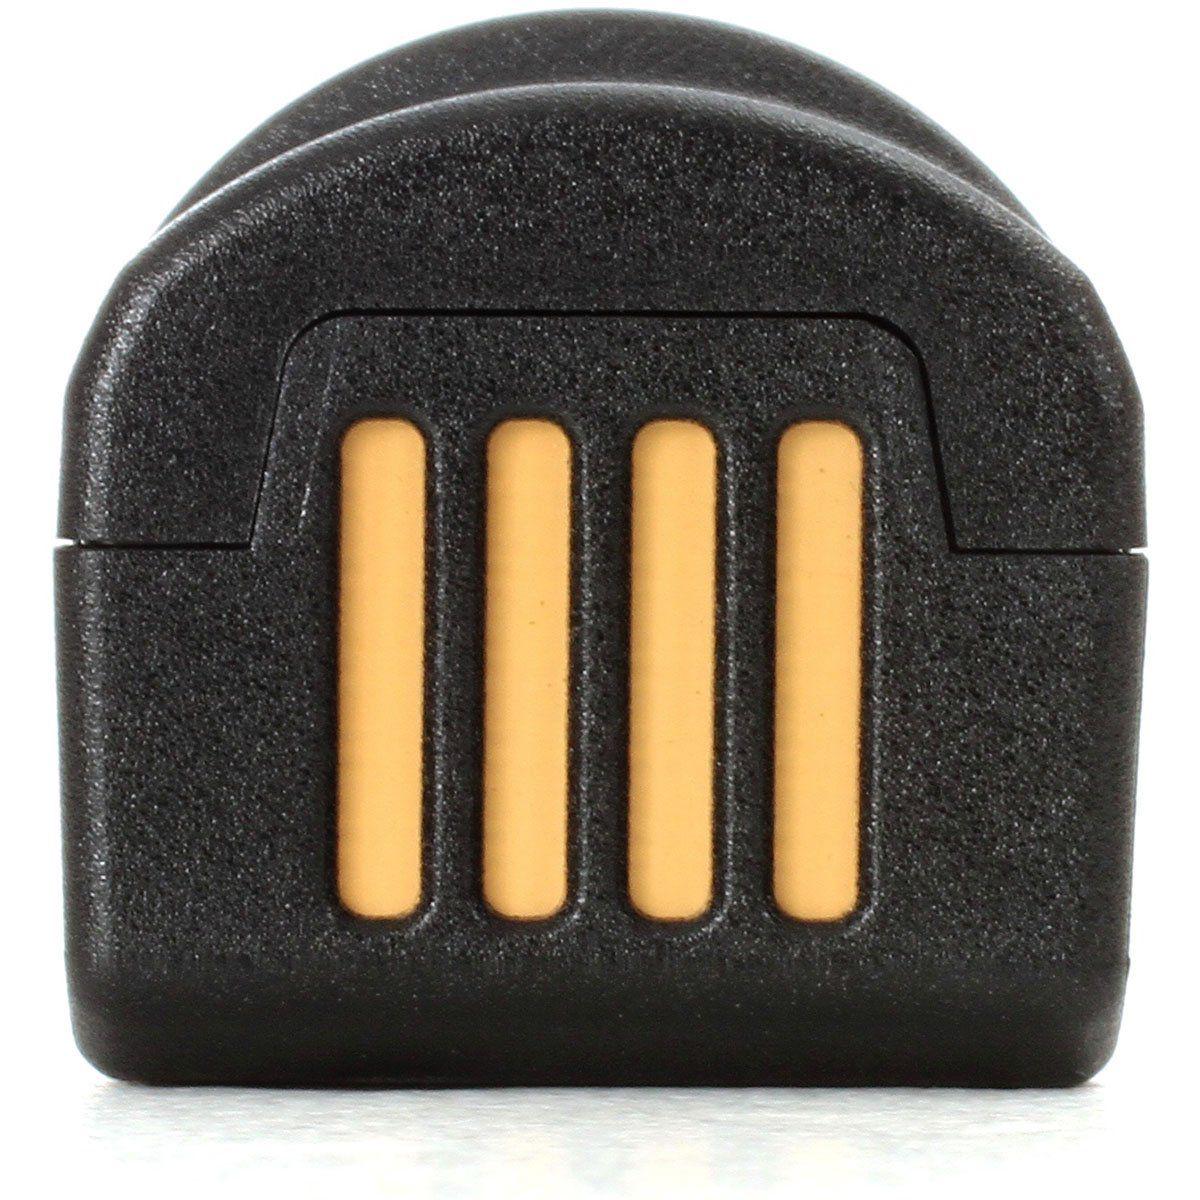 Shure SB902 Bateria Recarregável para GLXD